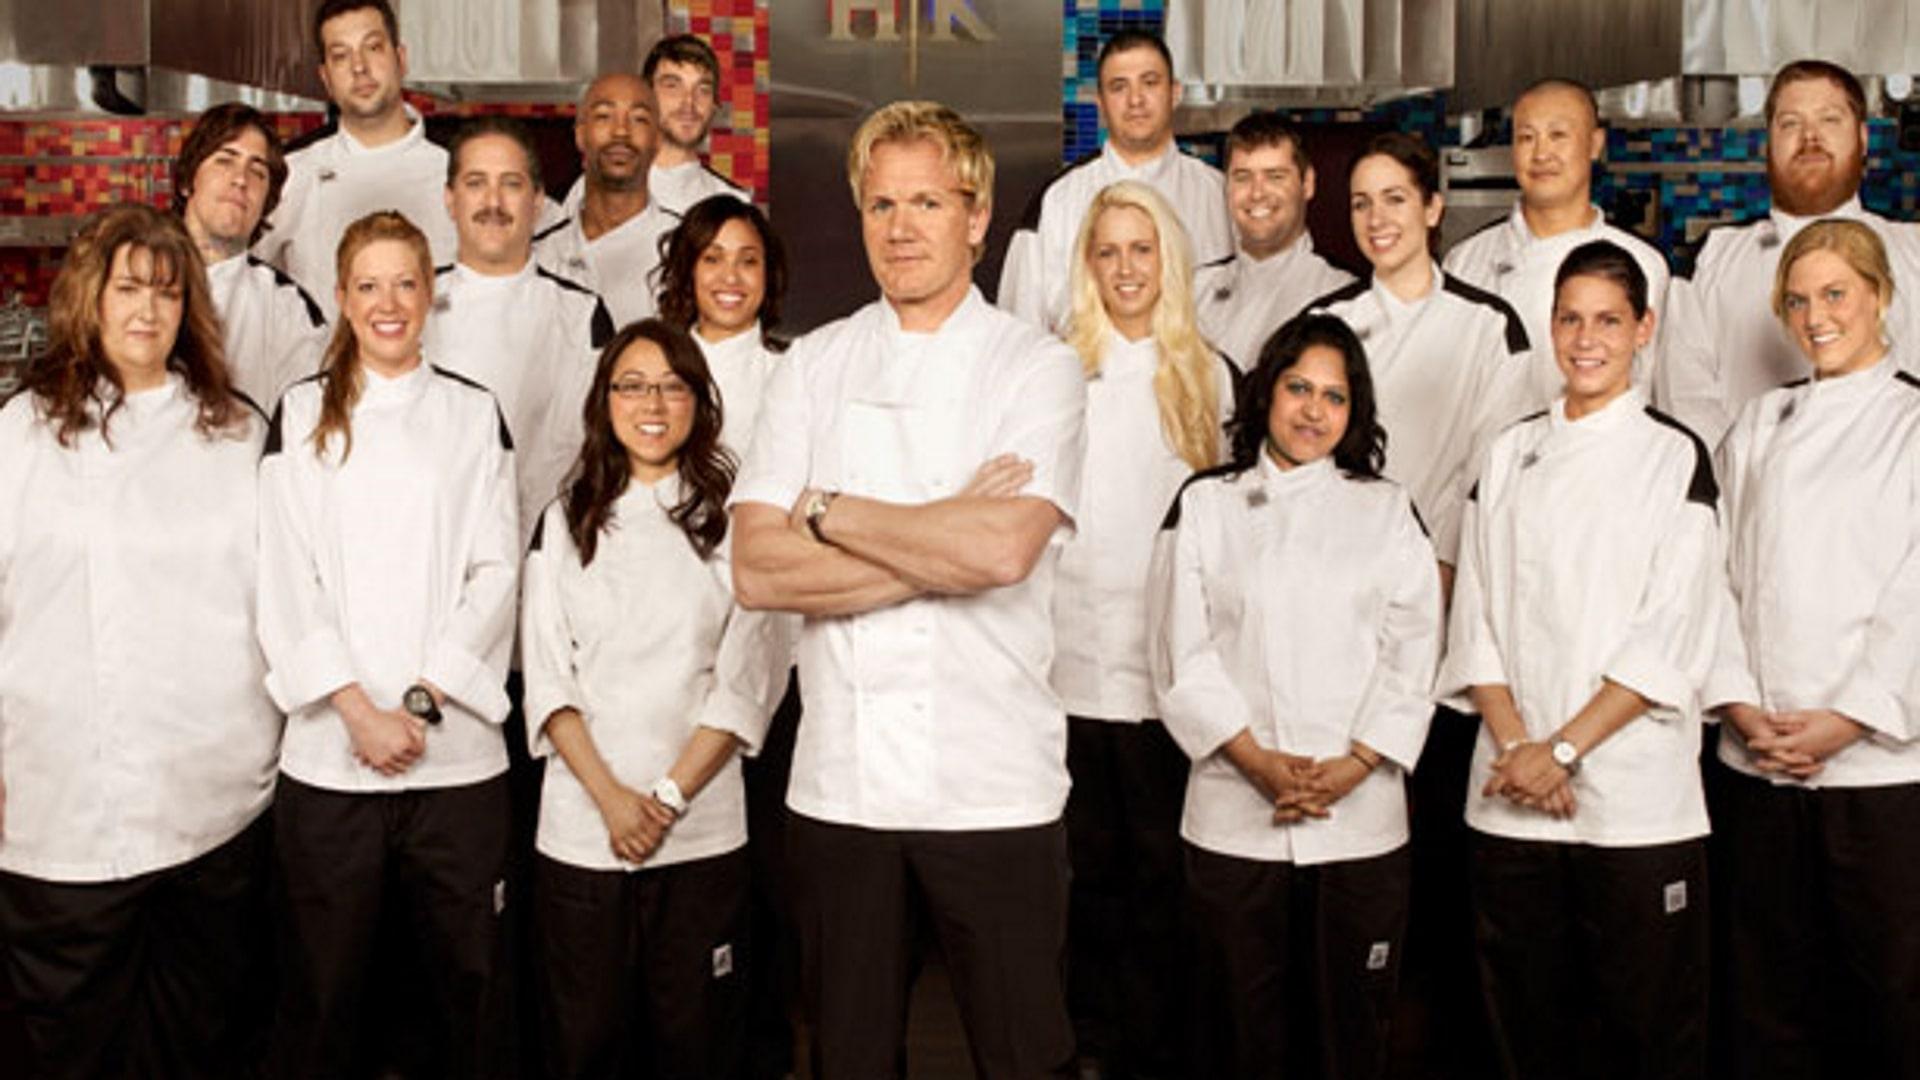 Hell's Kitchen - Season 18 Episode 06: Hot Potato - Watch ...What Happens In Vegas Gomovies